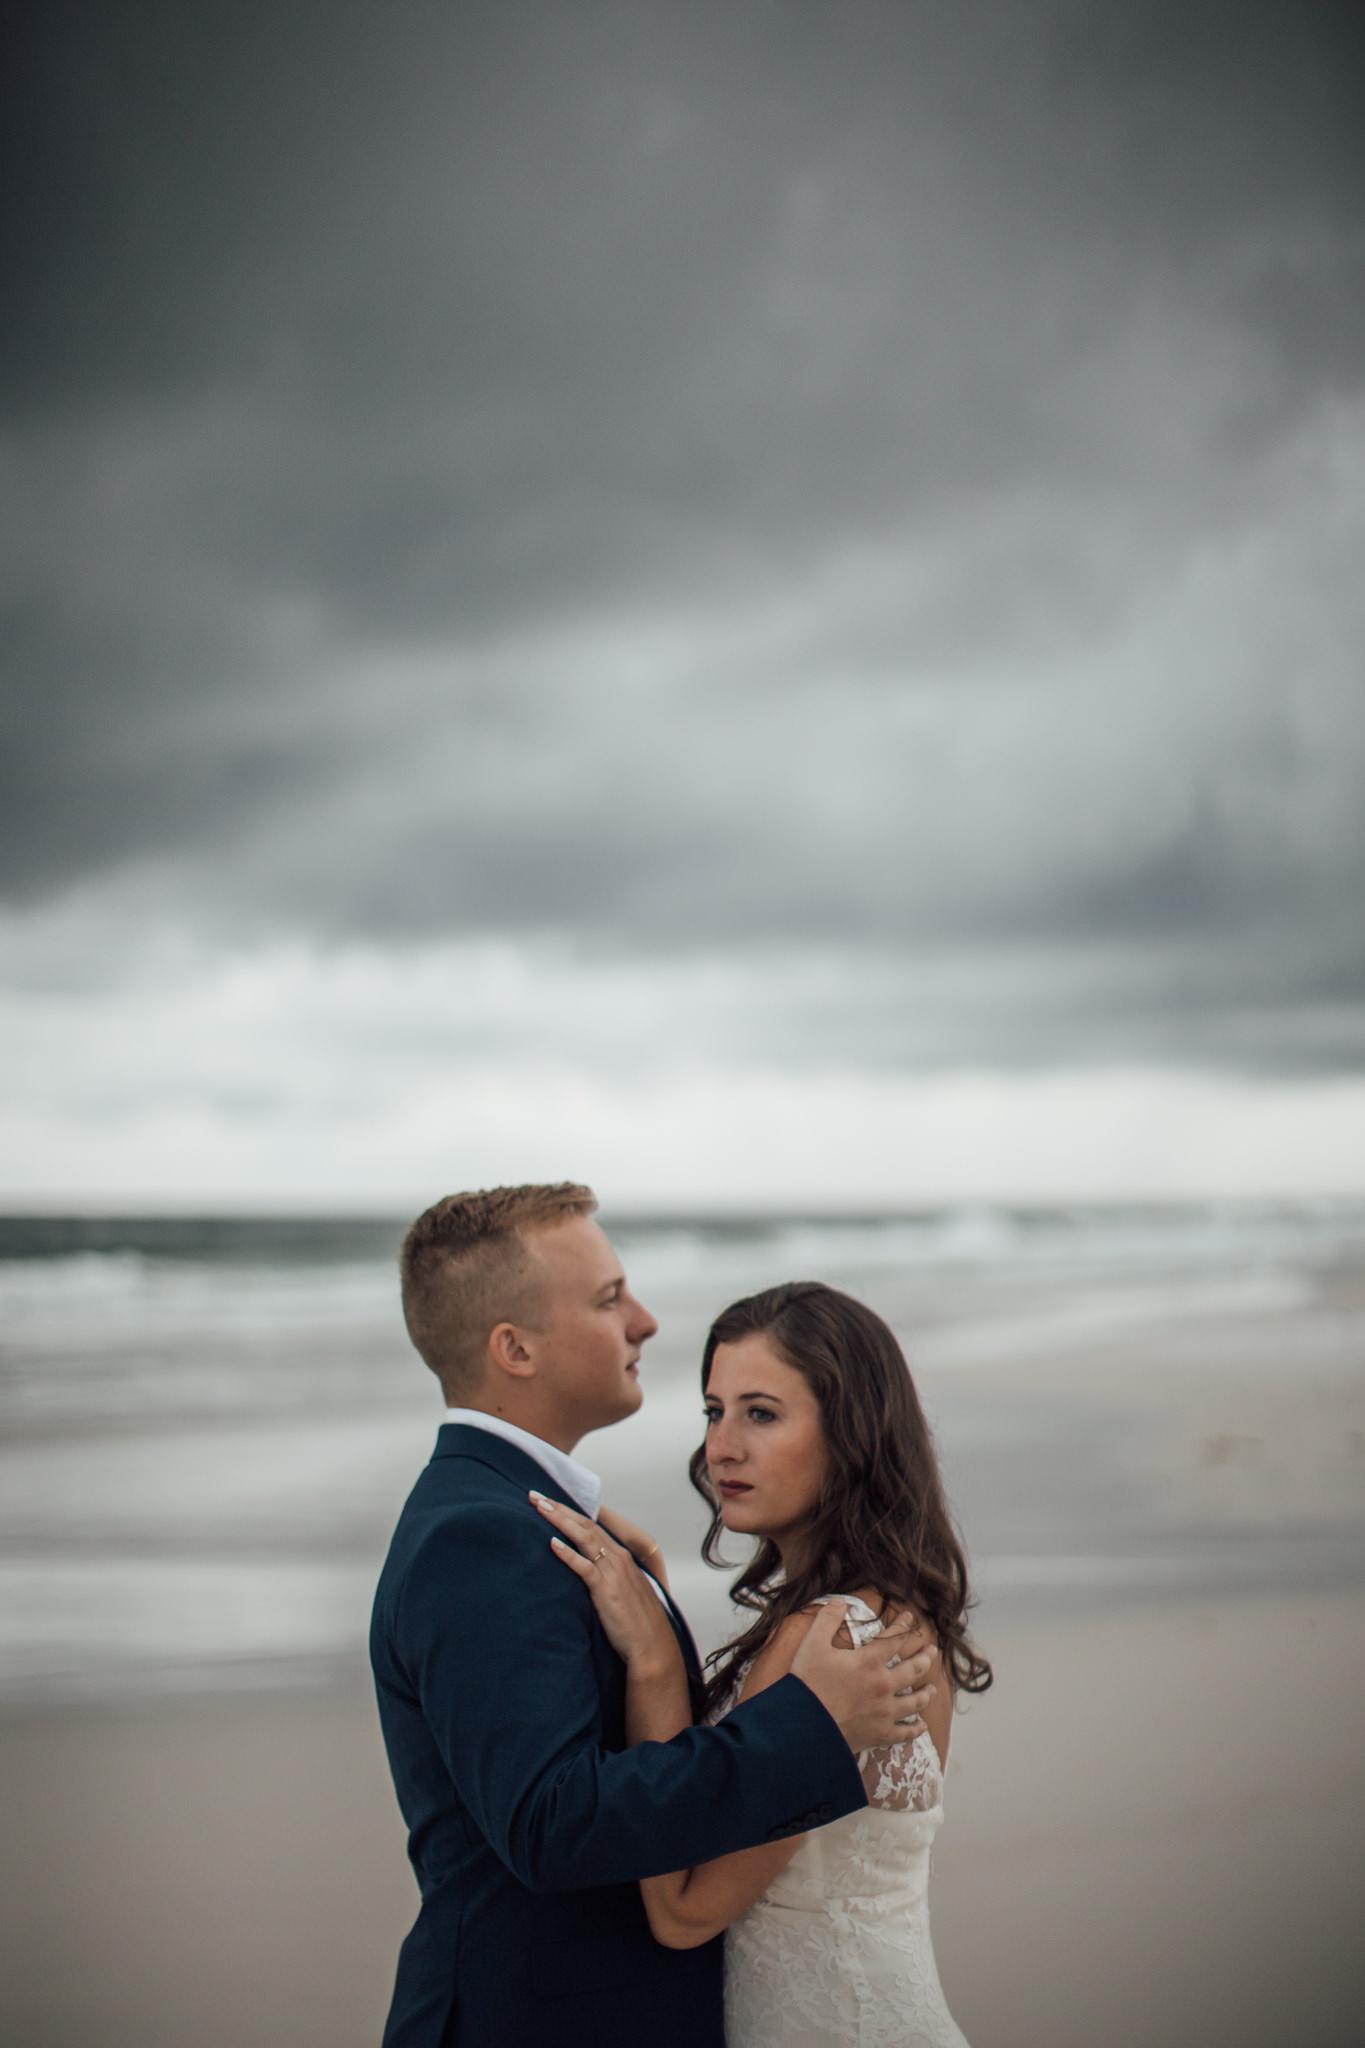 cassie-cook-photography-santa-rosa-beach-wedding-farrar-wedding-47.jpg